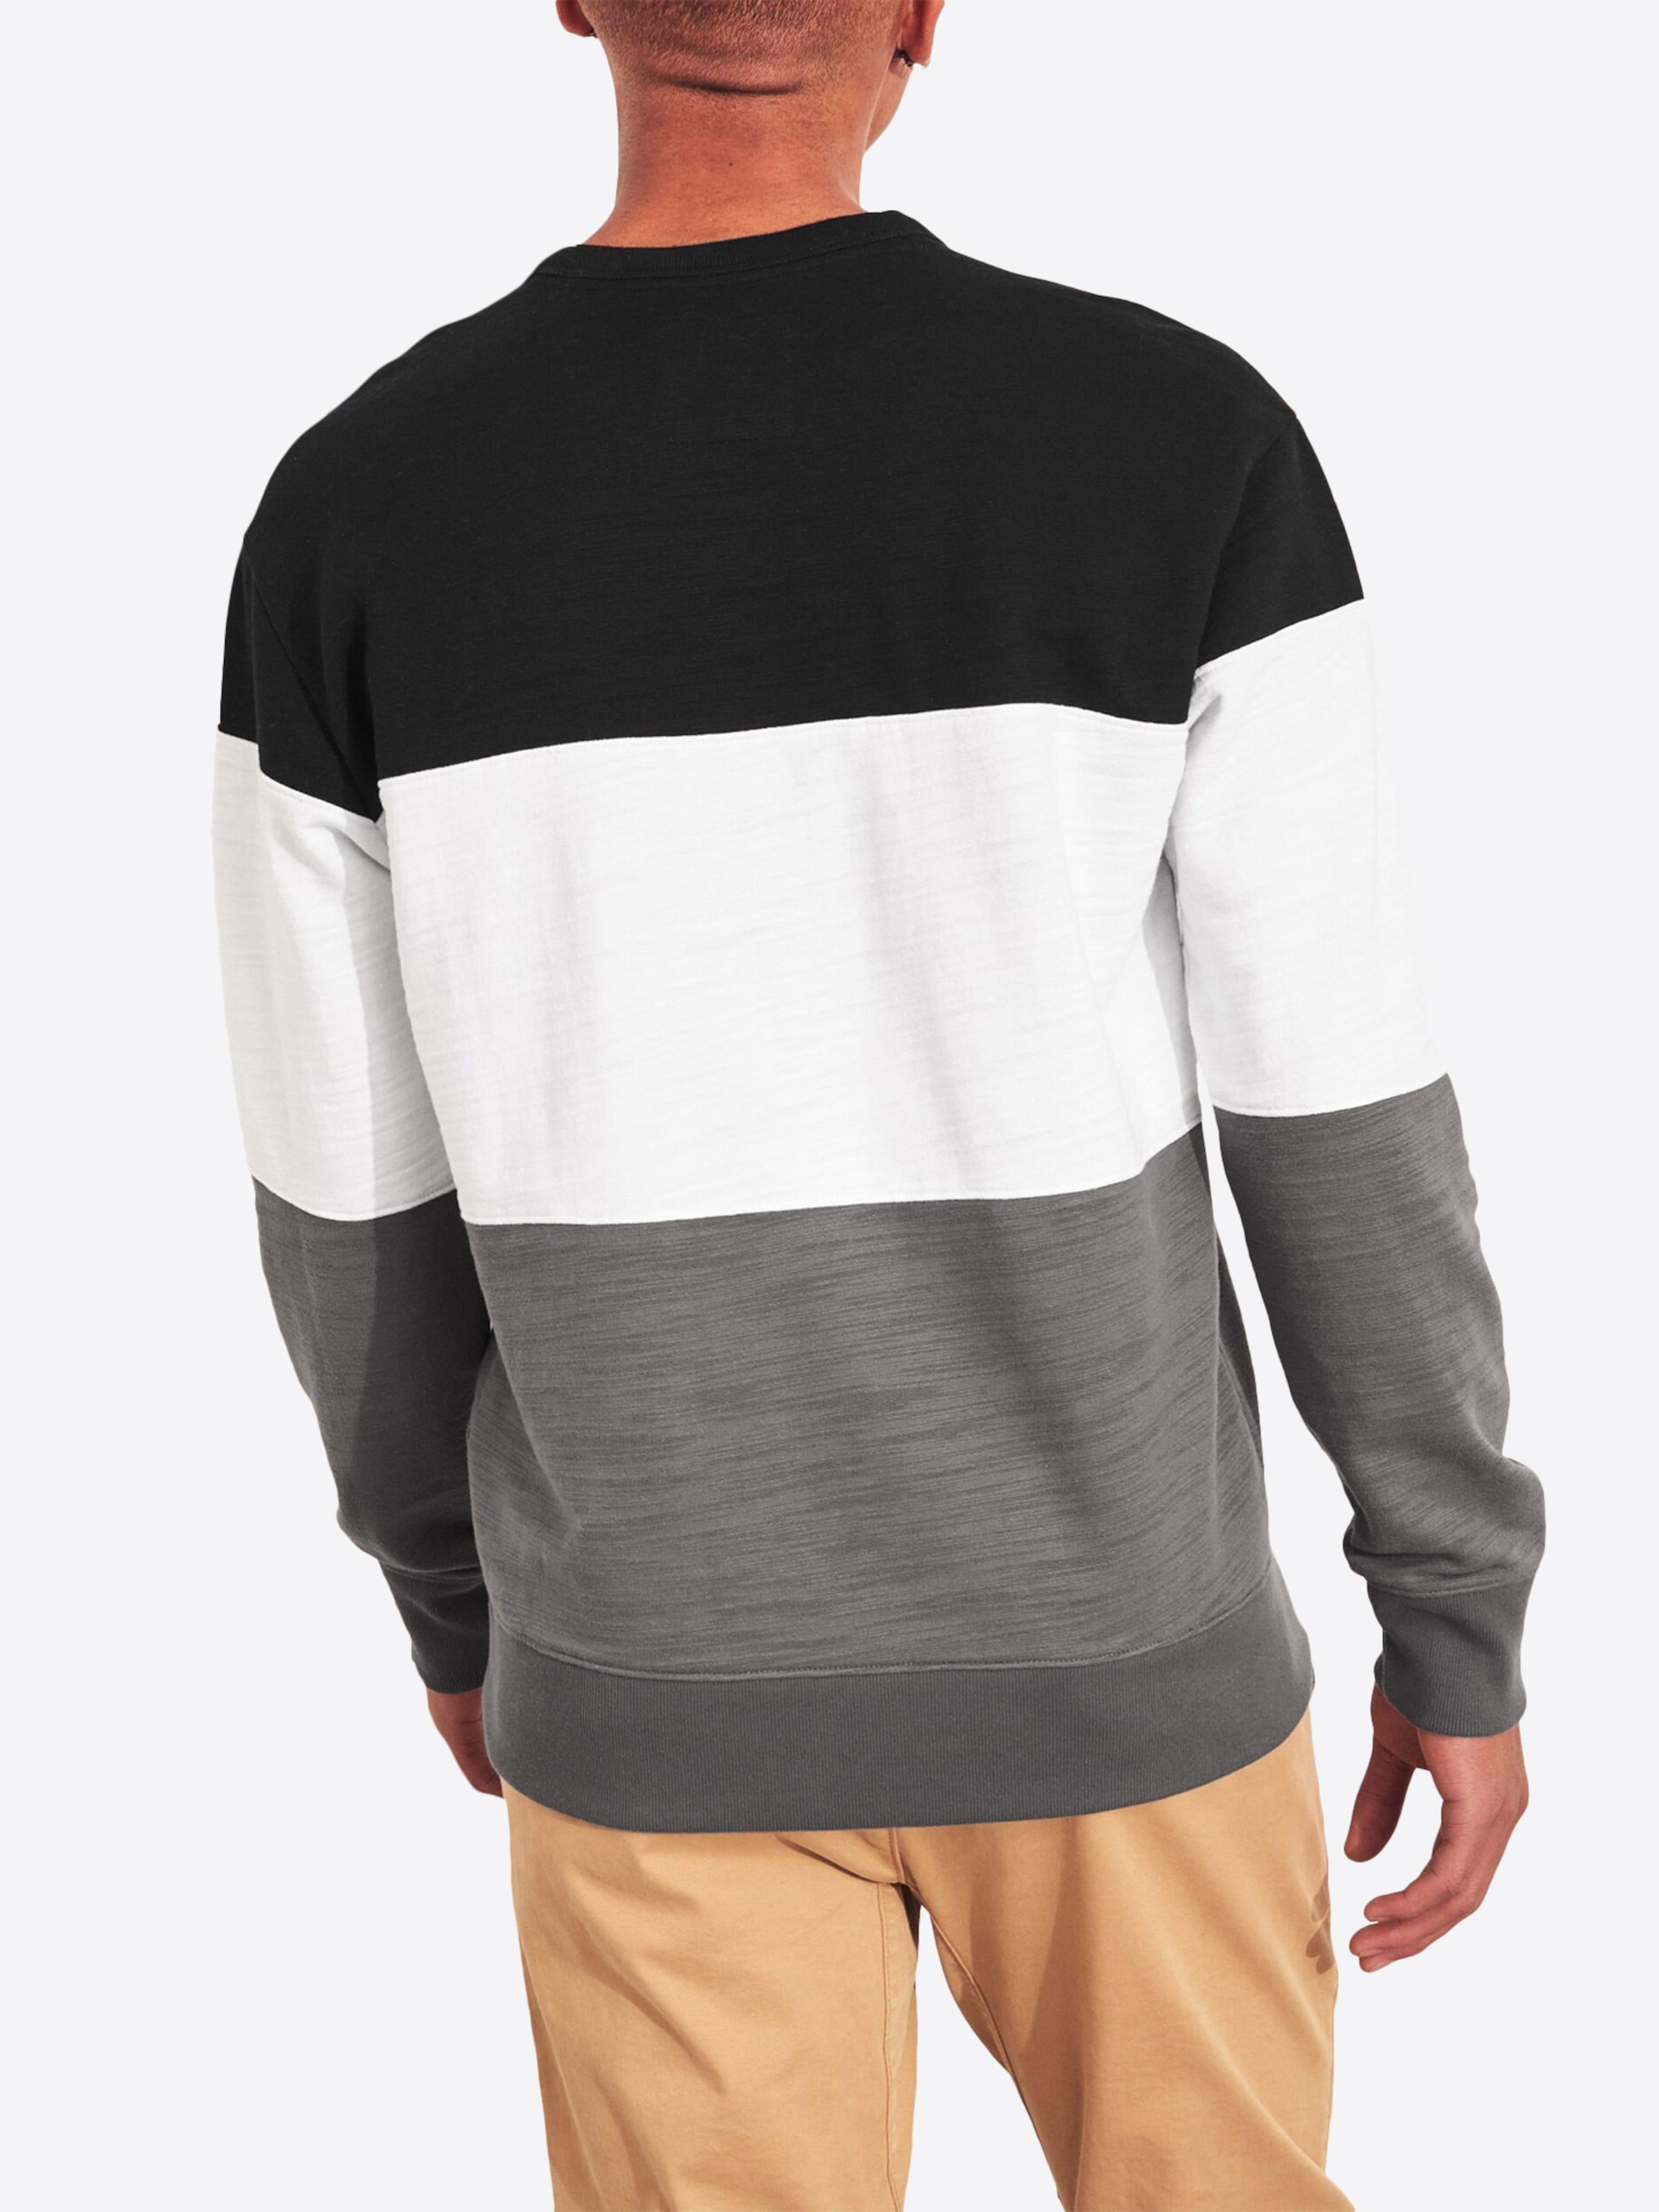 Hollister Sweat shirt Sweat Cappuccino shirt Hollister Cappuccino Sweat En En Hollister thdCsrxQ